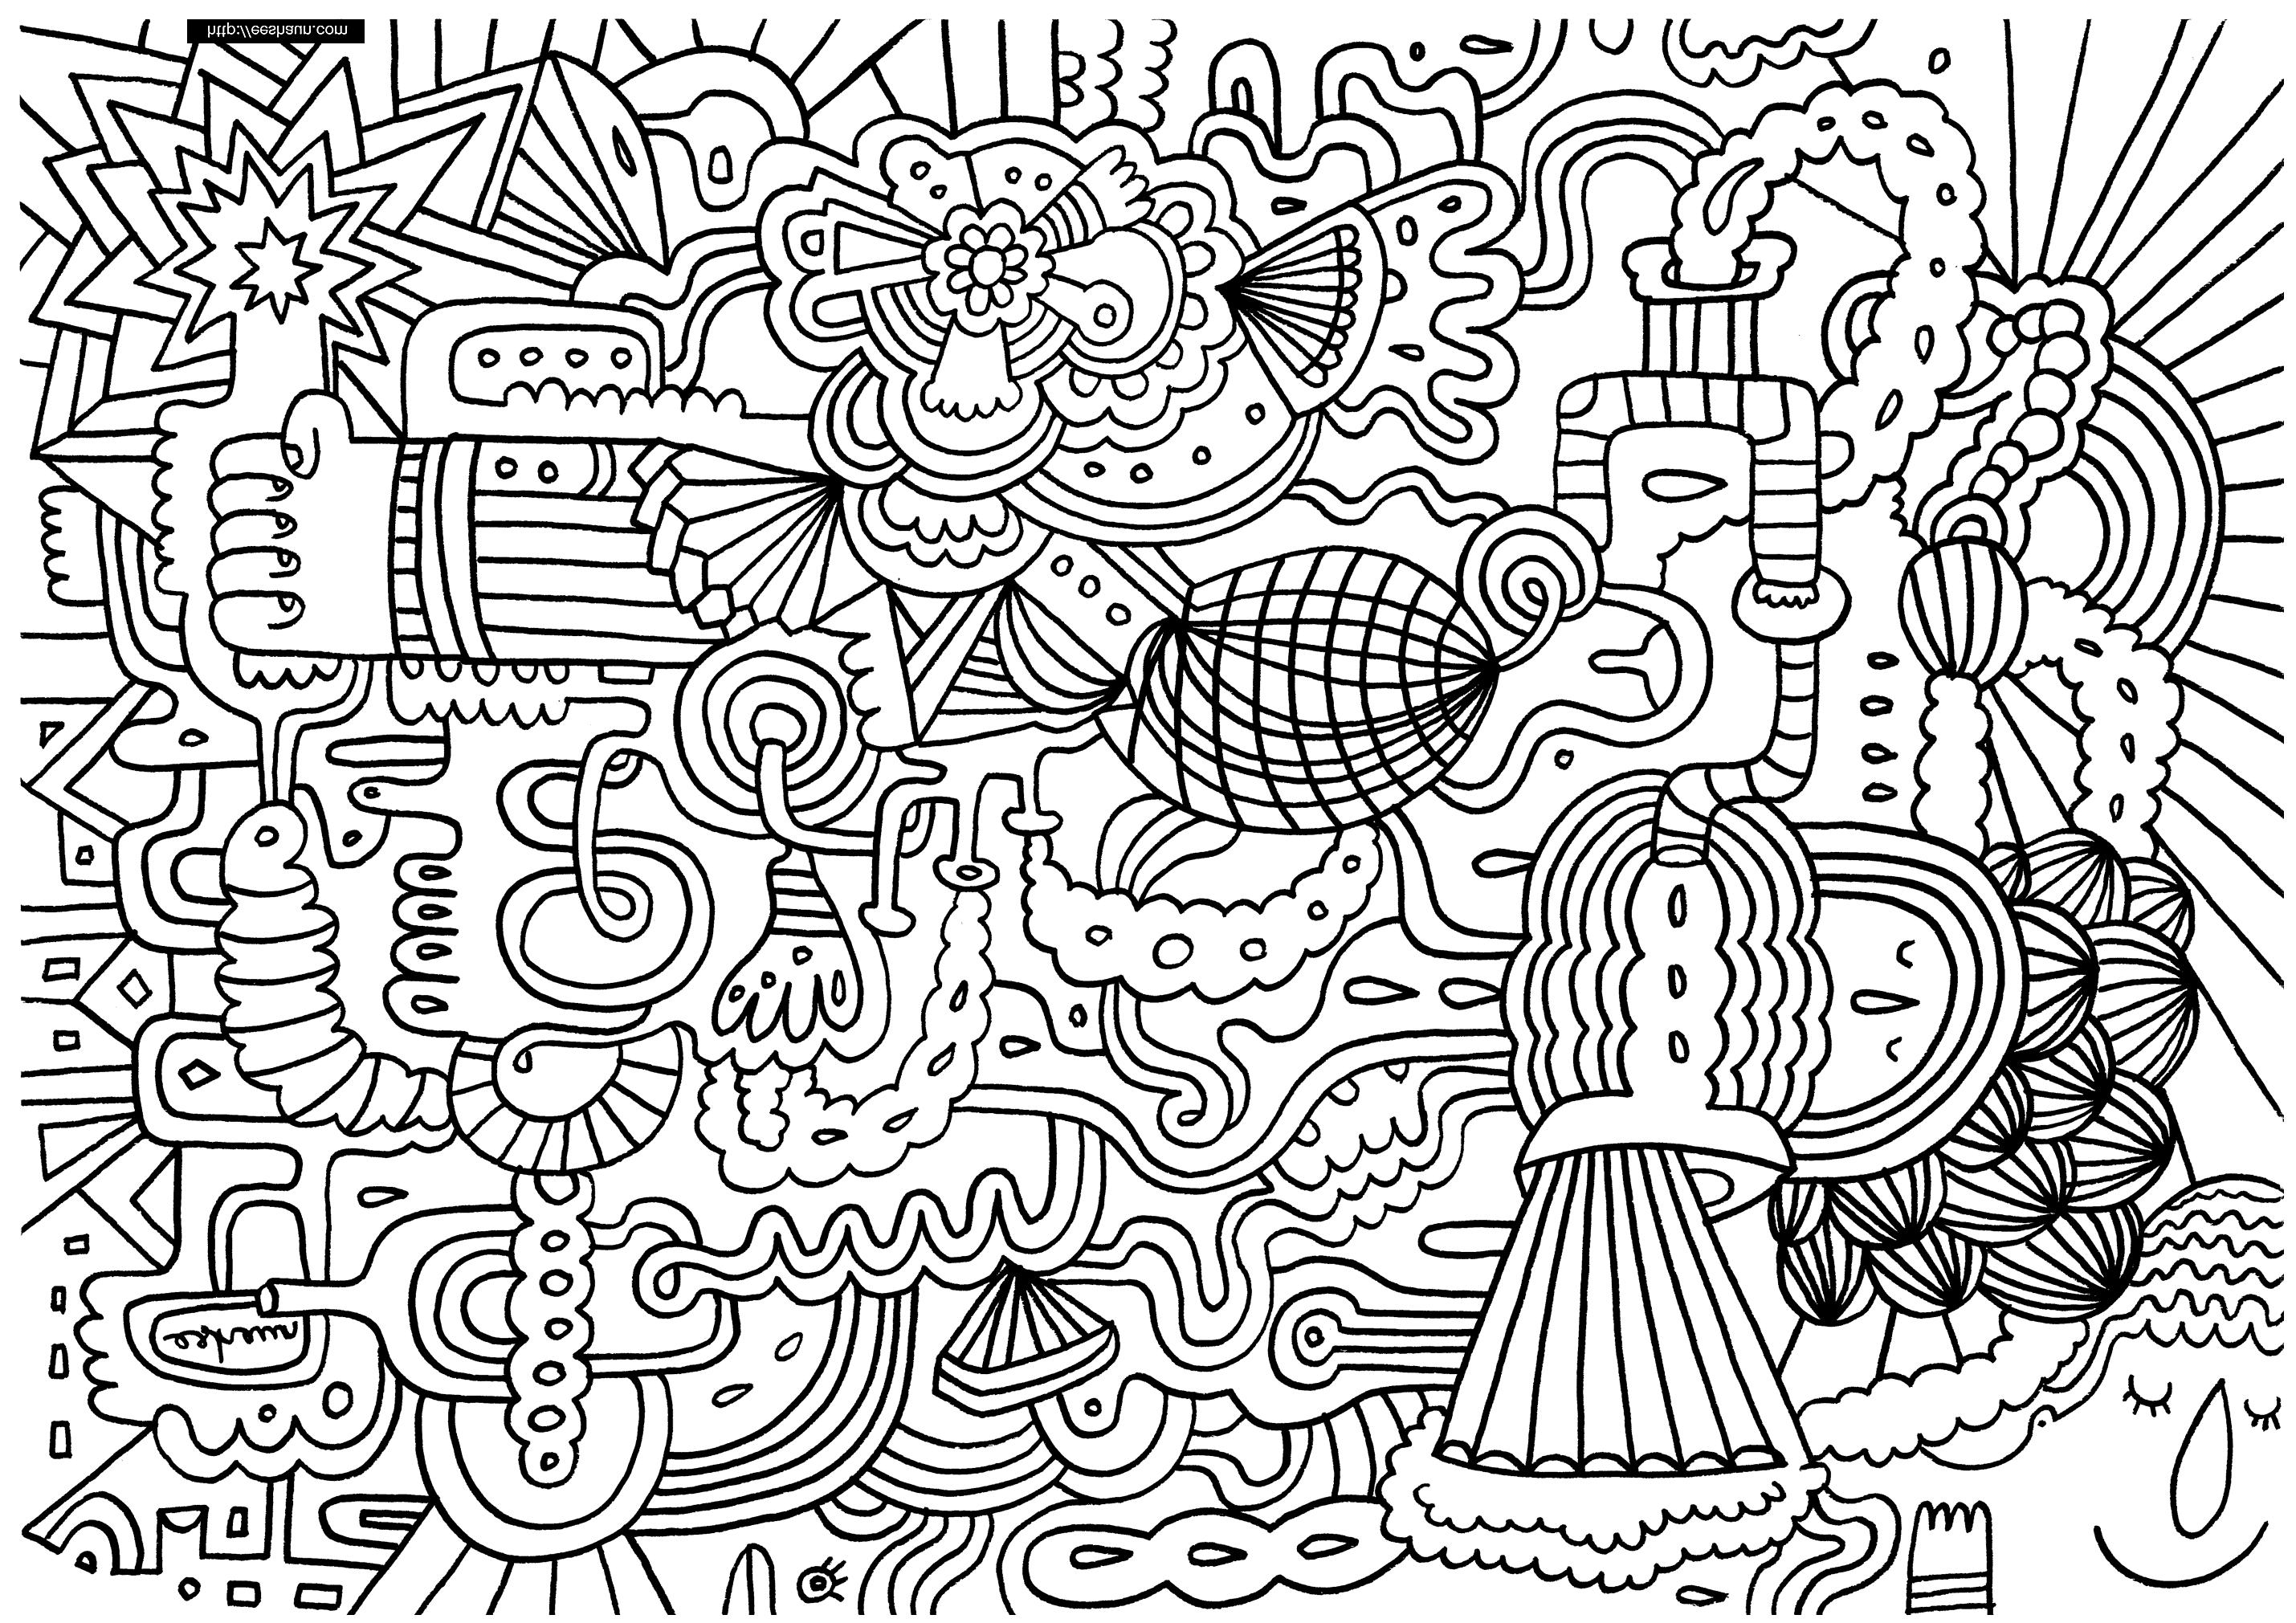 Disegni da colorare per adulti : Doodle art / Doodling - 17